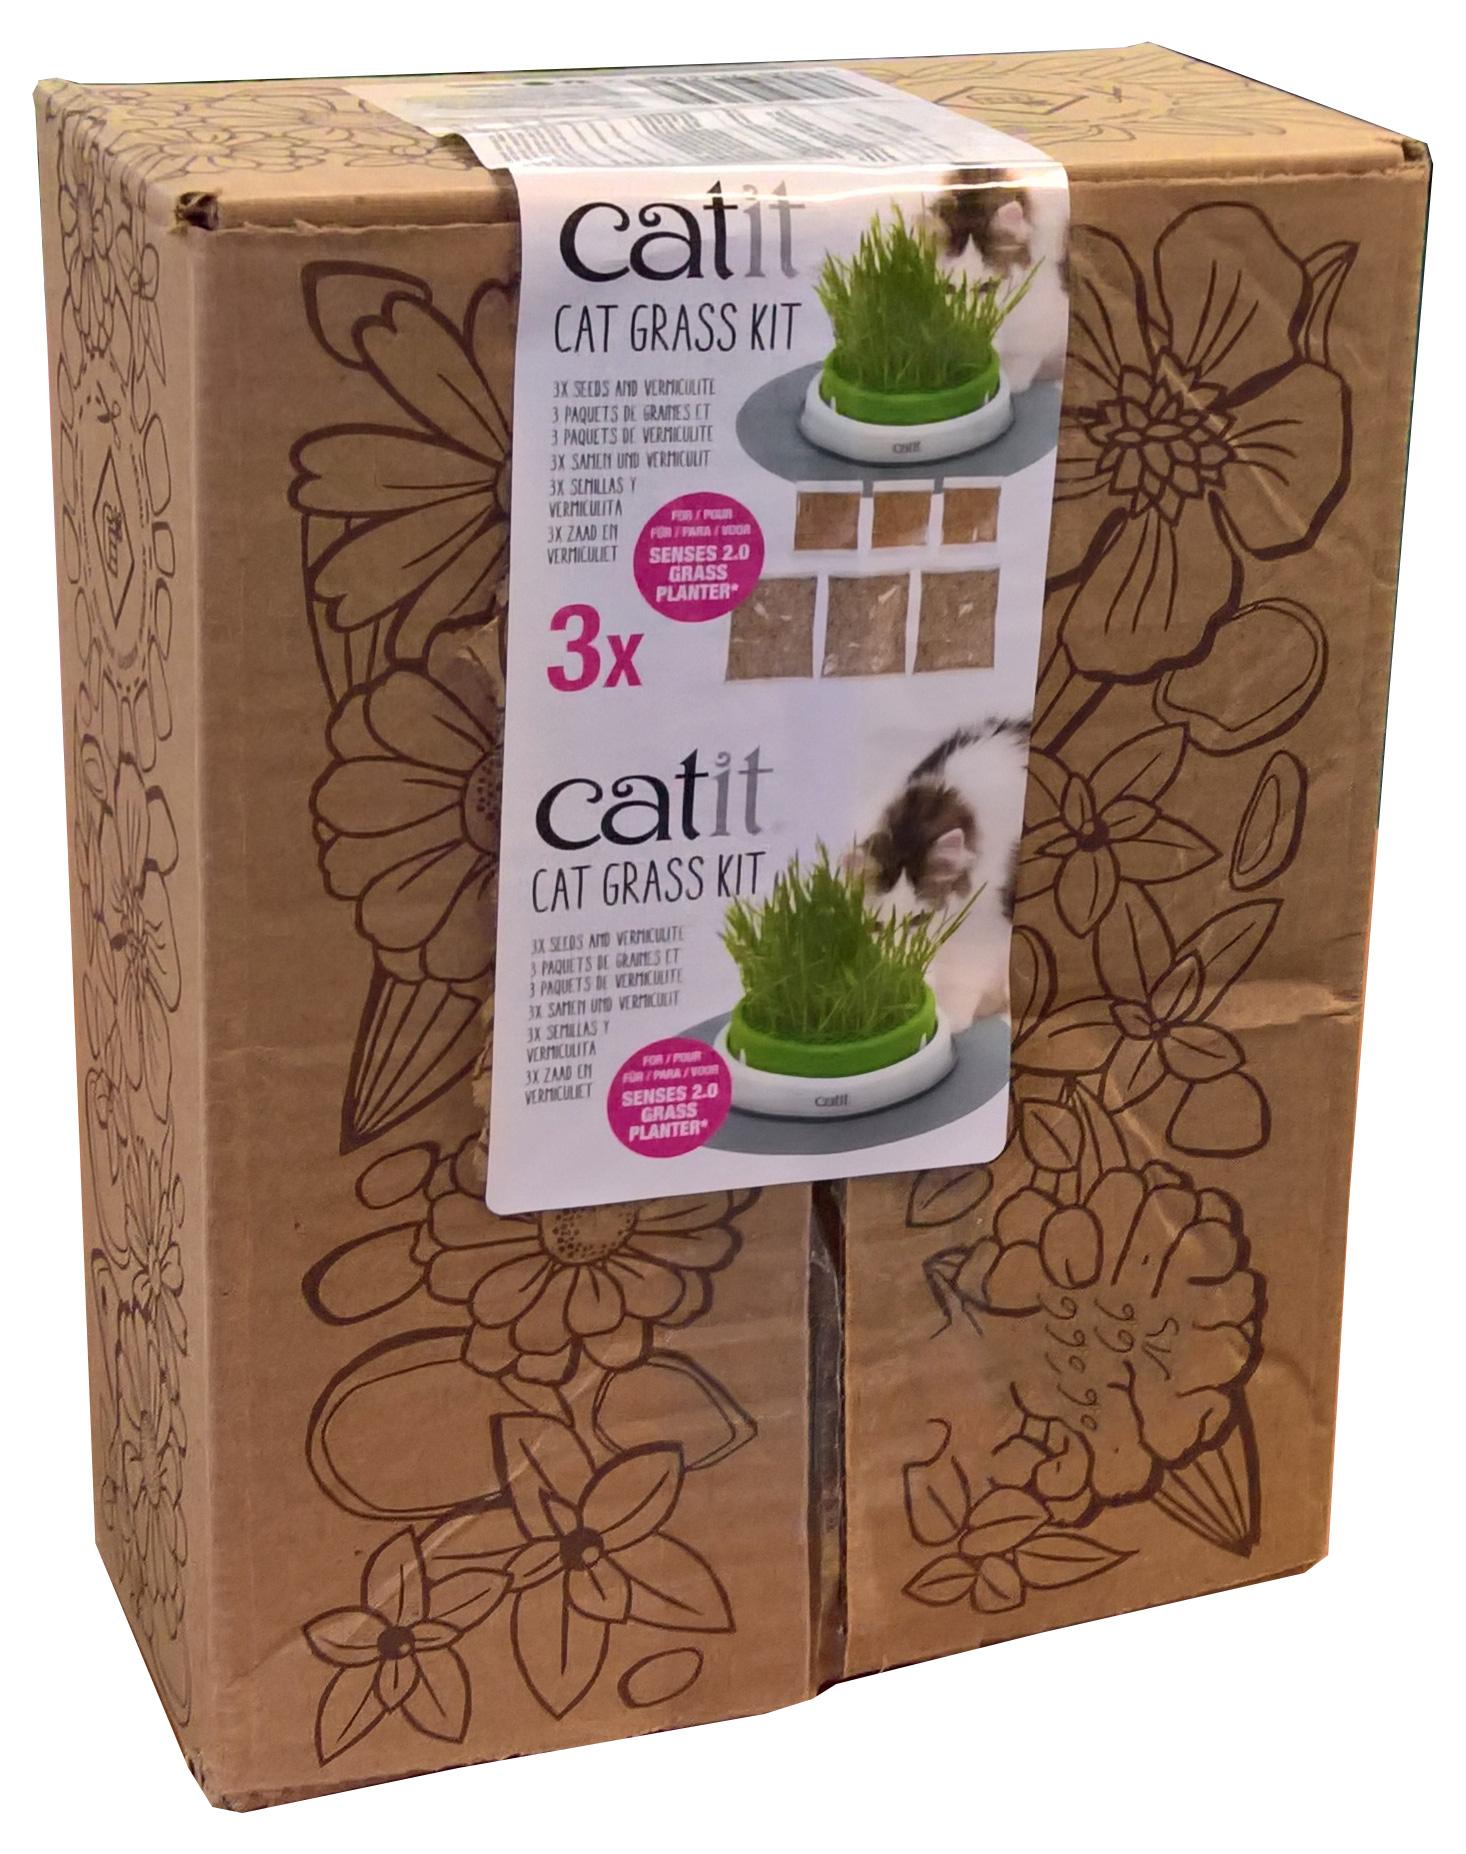 Cat It Catit Cat Grass Kit, set of 3